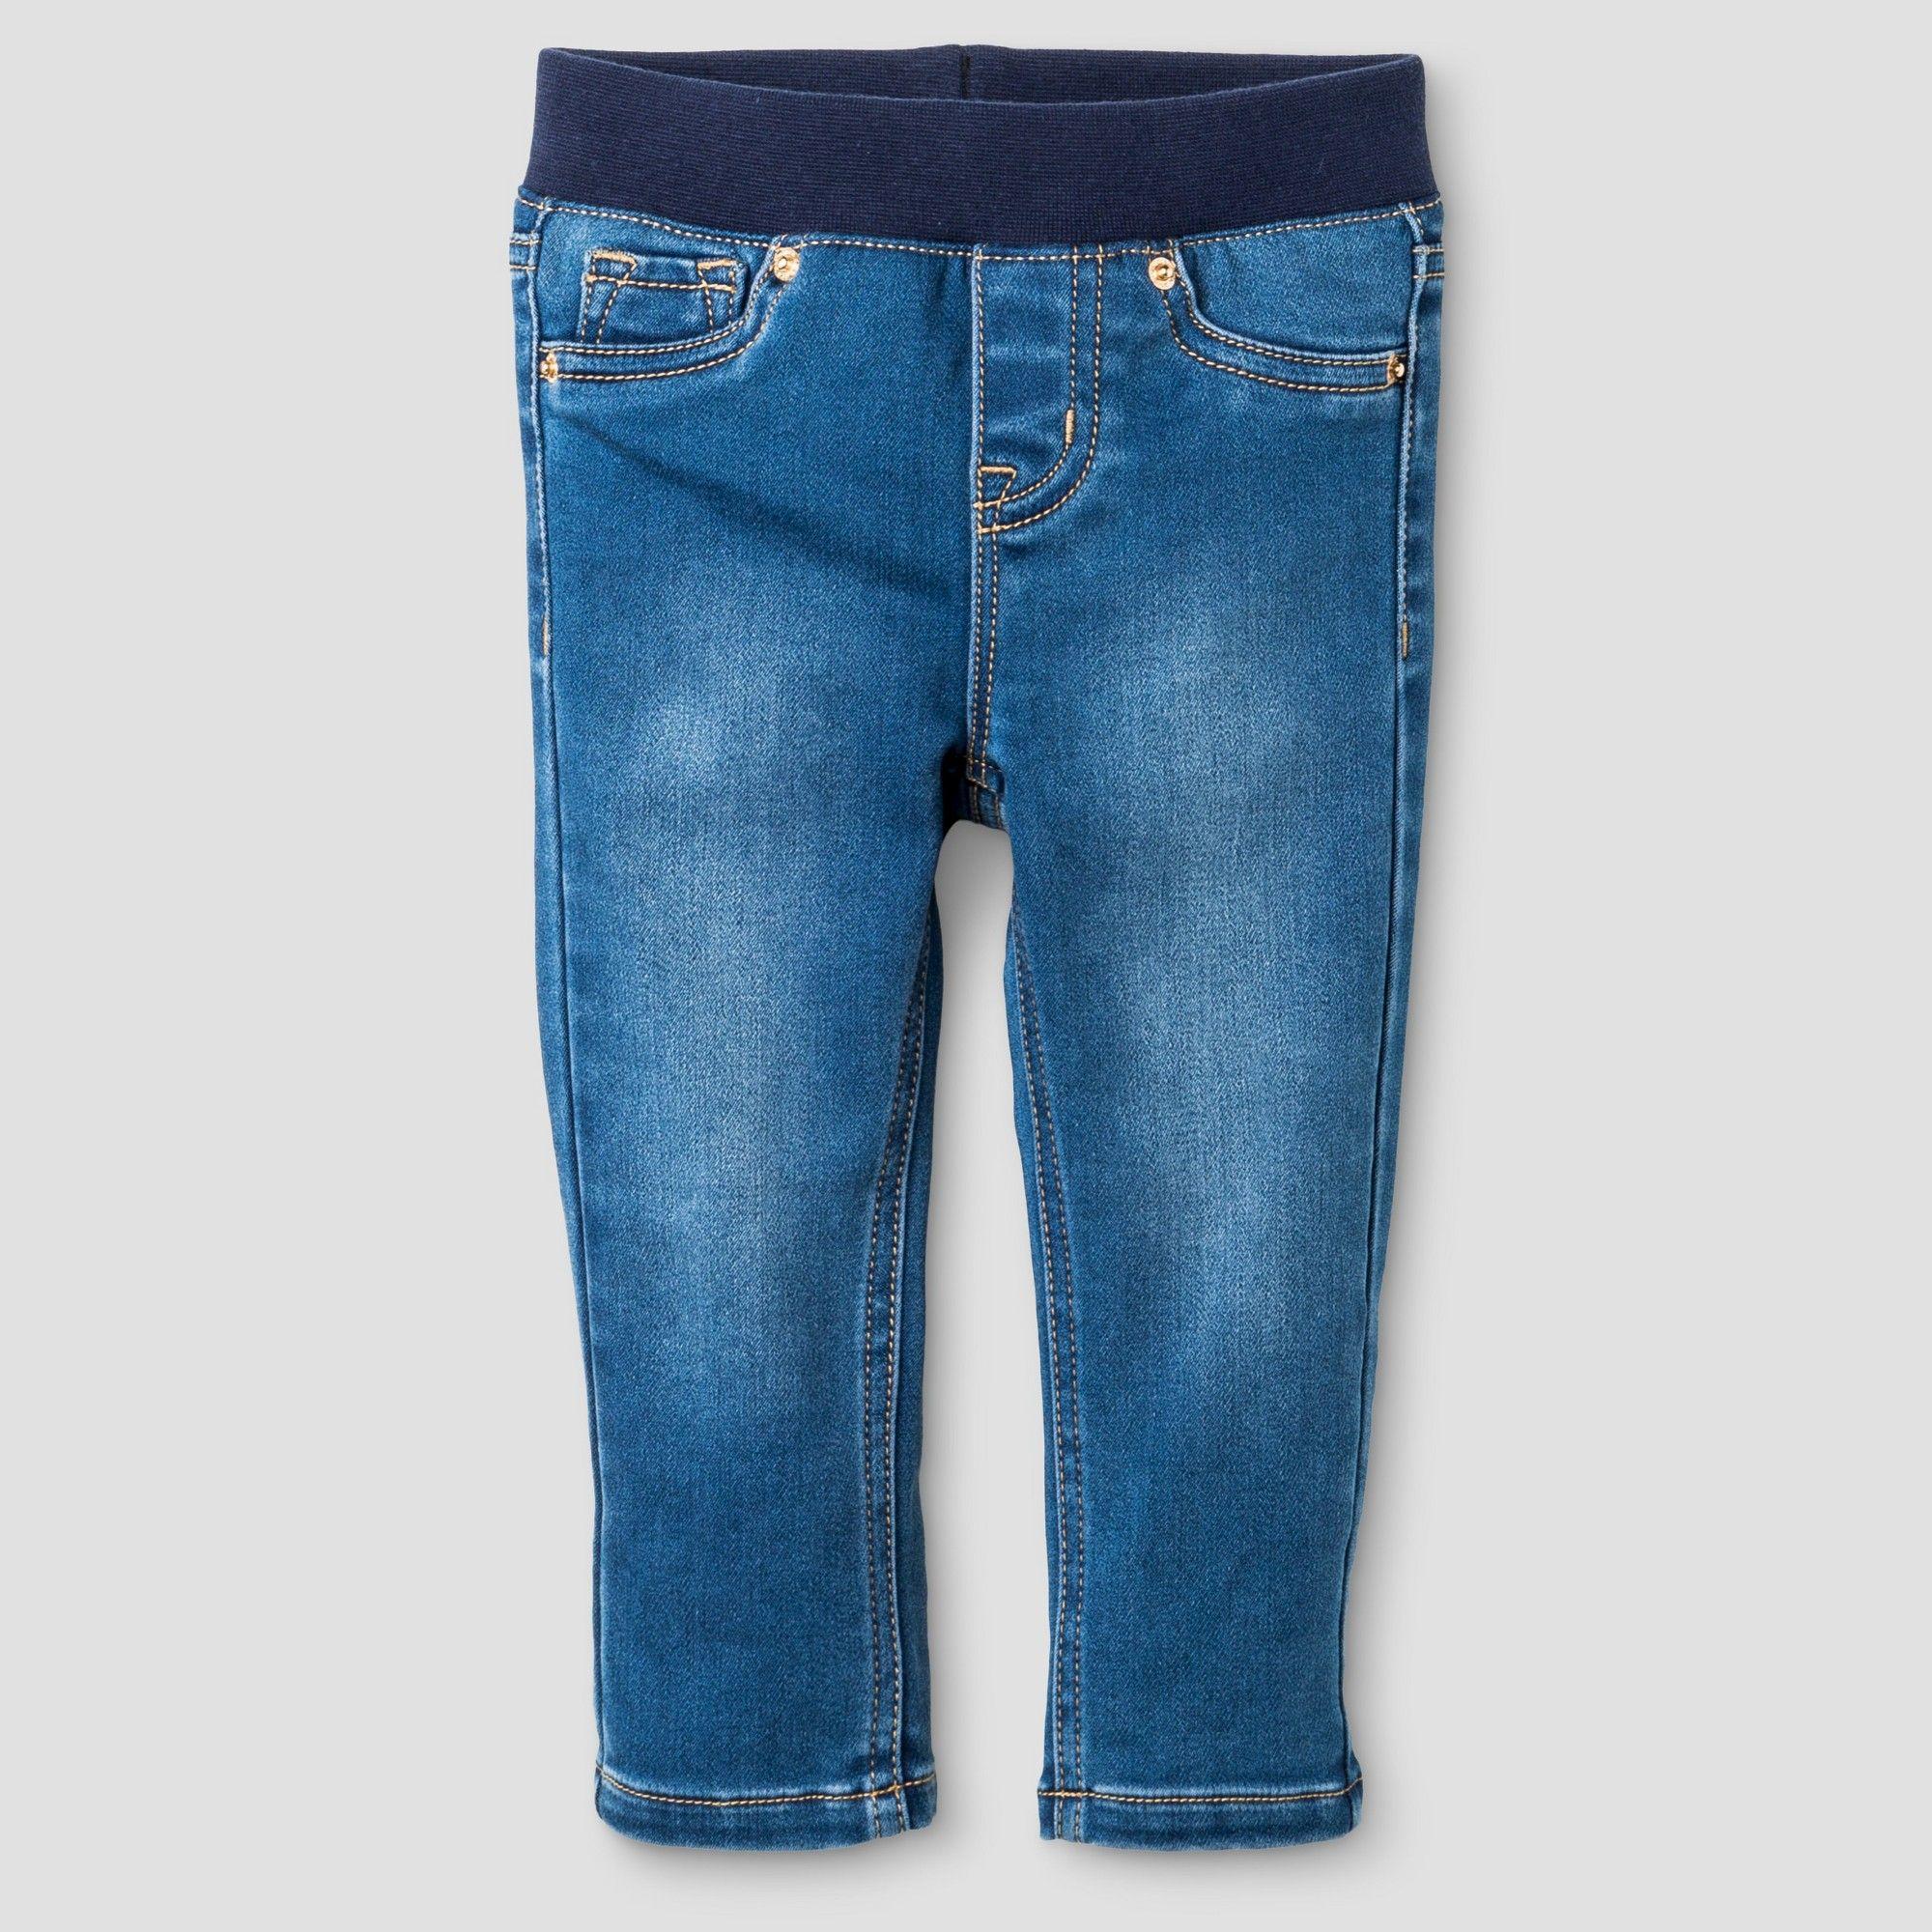 cef28b4587dc Toddler Girls  Jeggings Medium Wash Knit Denim - Cat   Jack Blue 12M ...